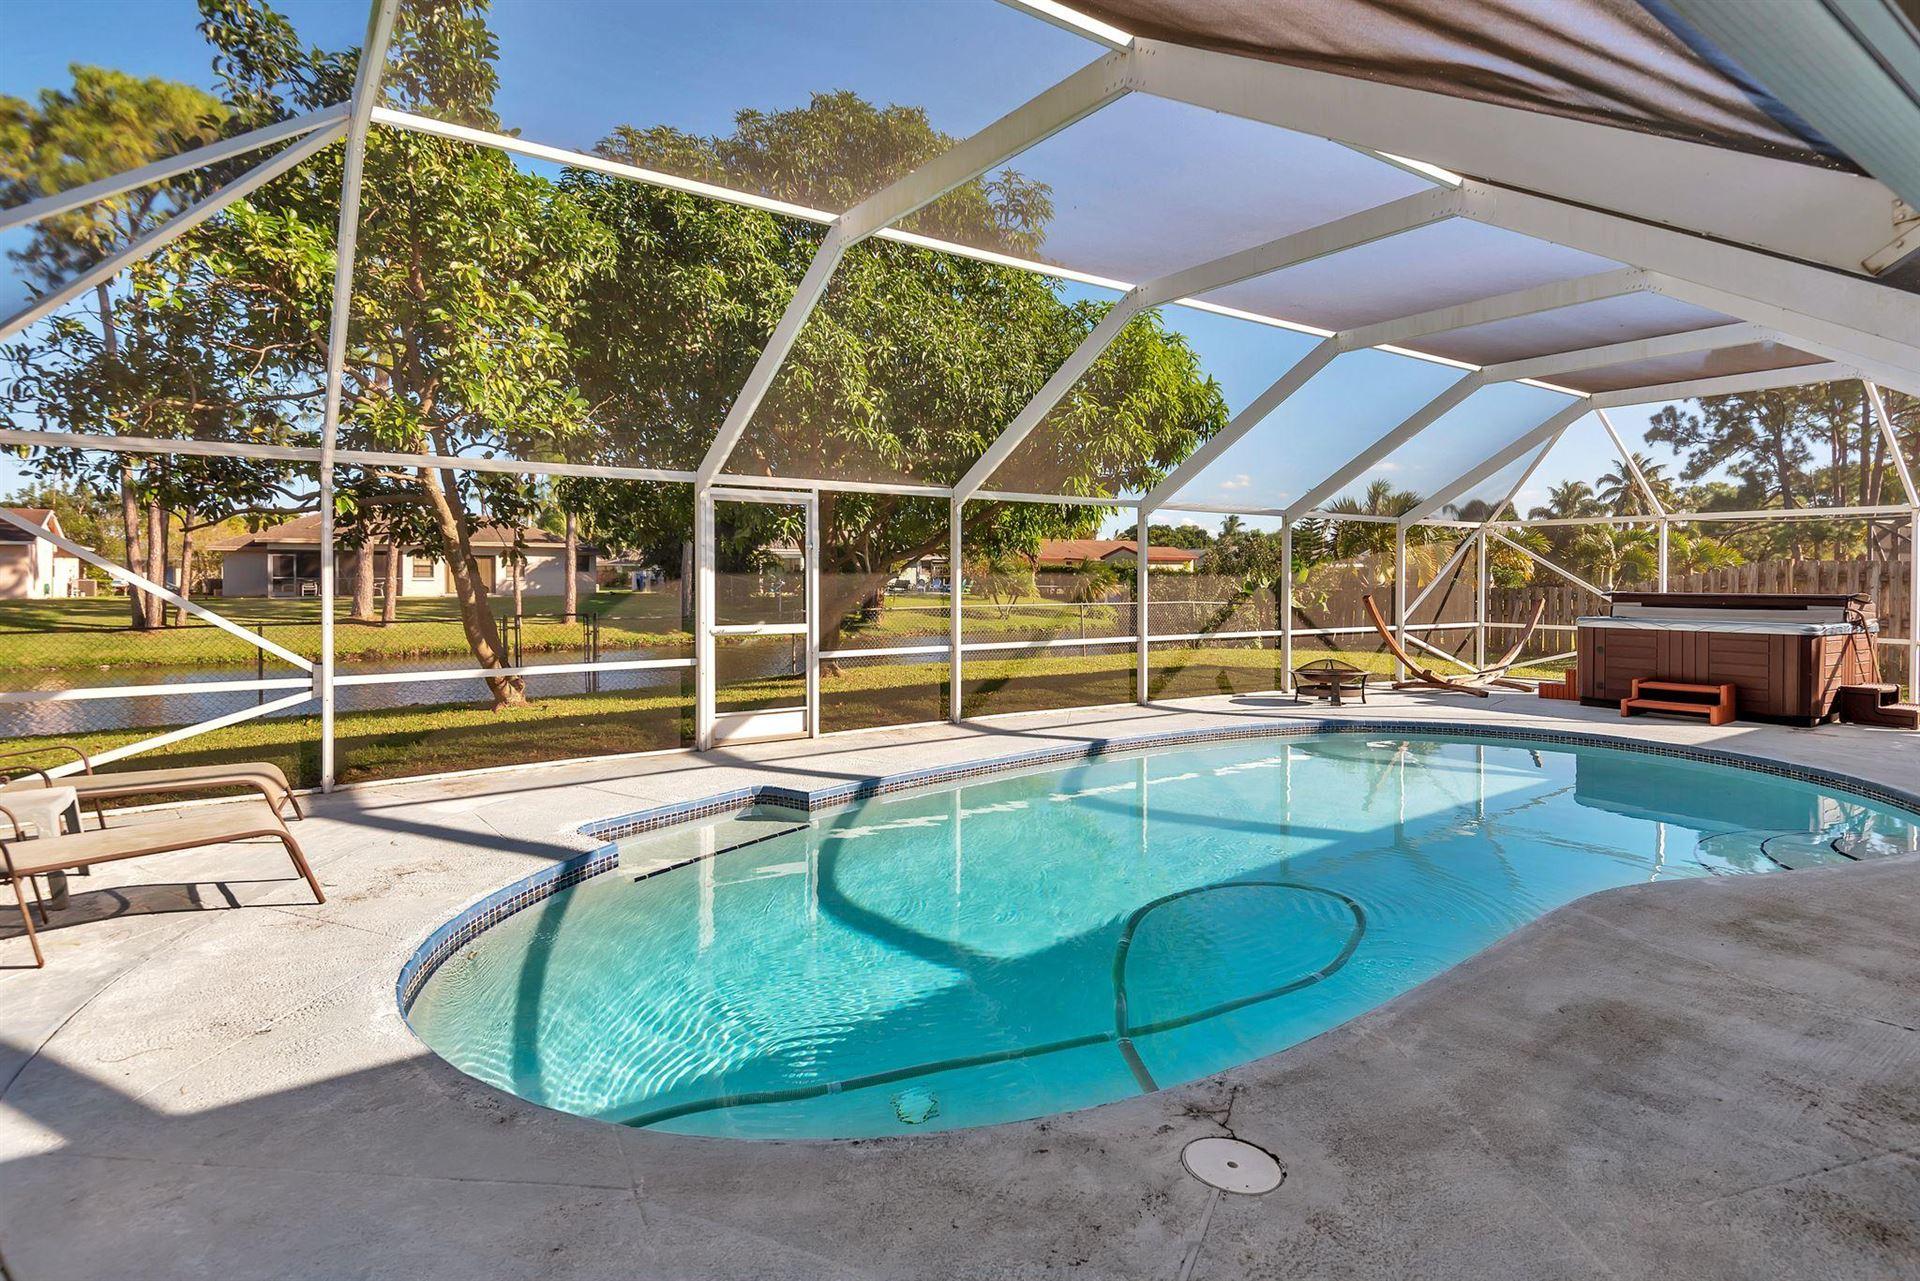 149 Starling Avenue, Royal Palm Beach, FL 33411 - #: RX-10675247